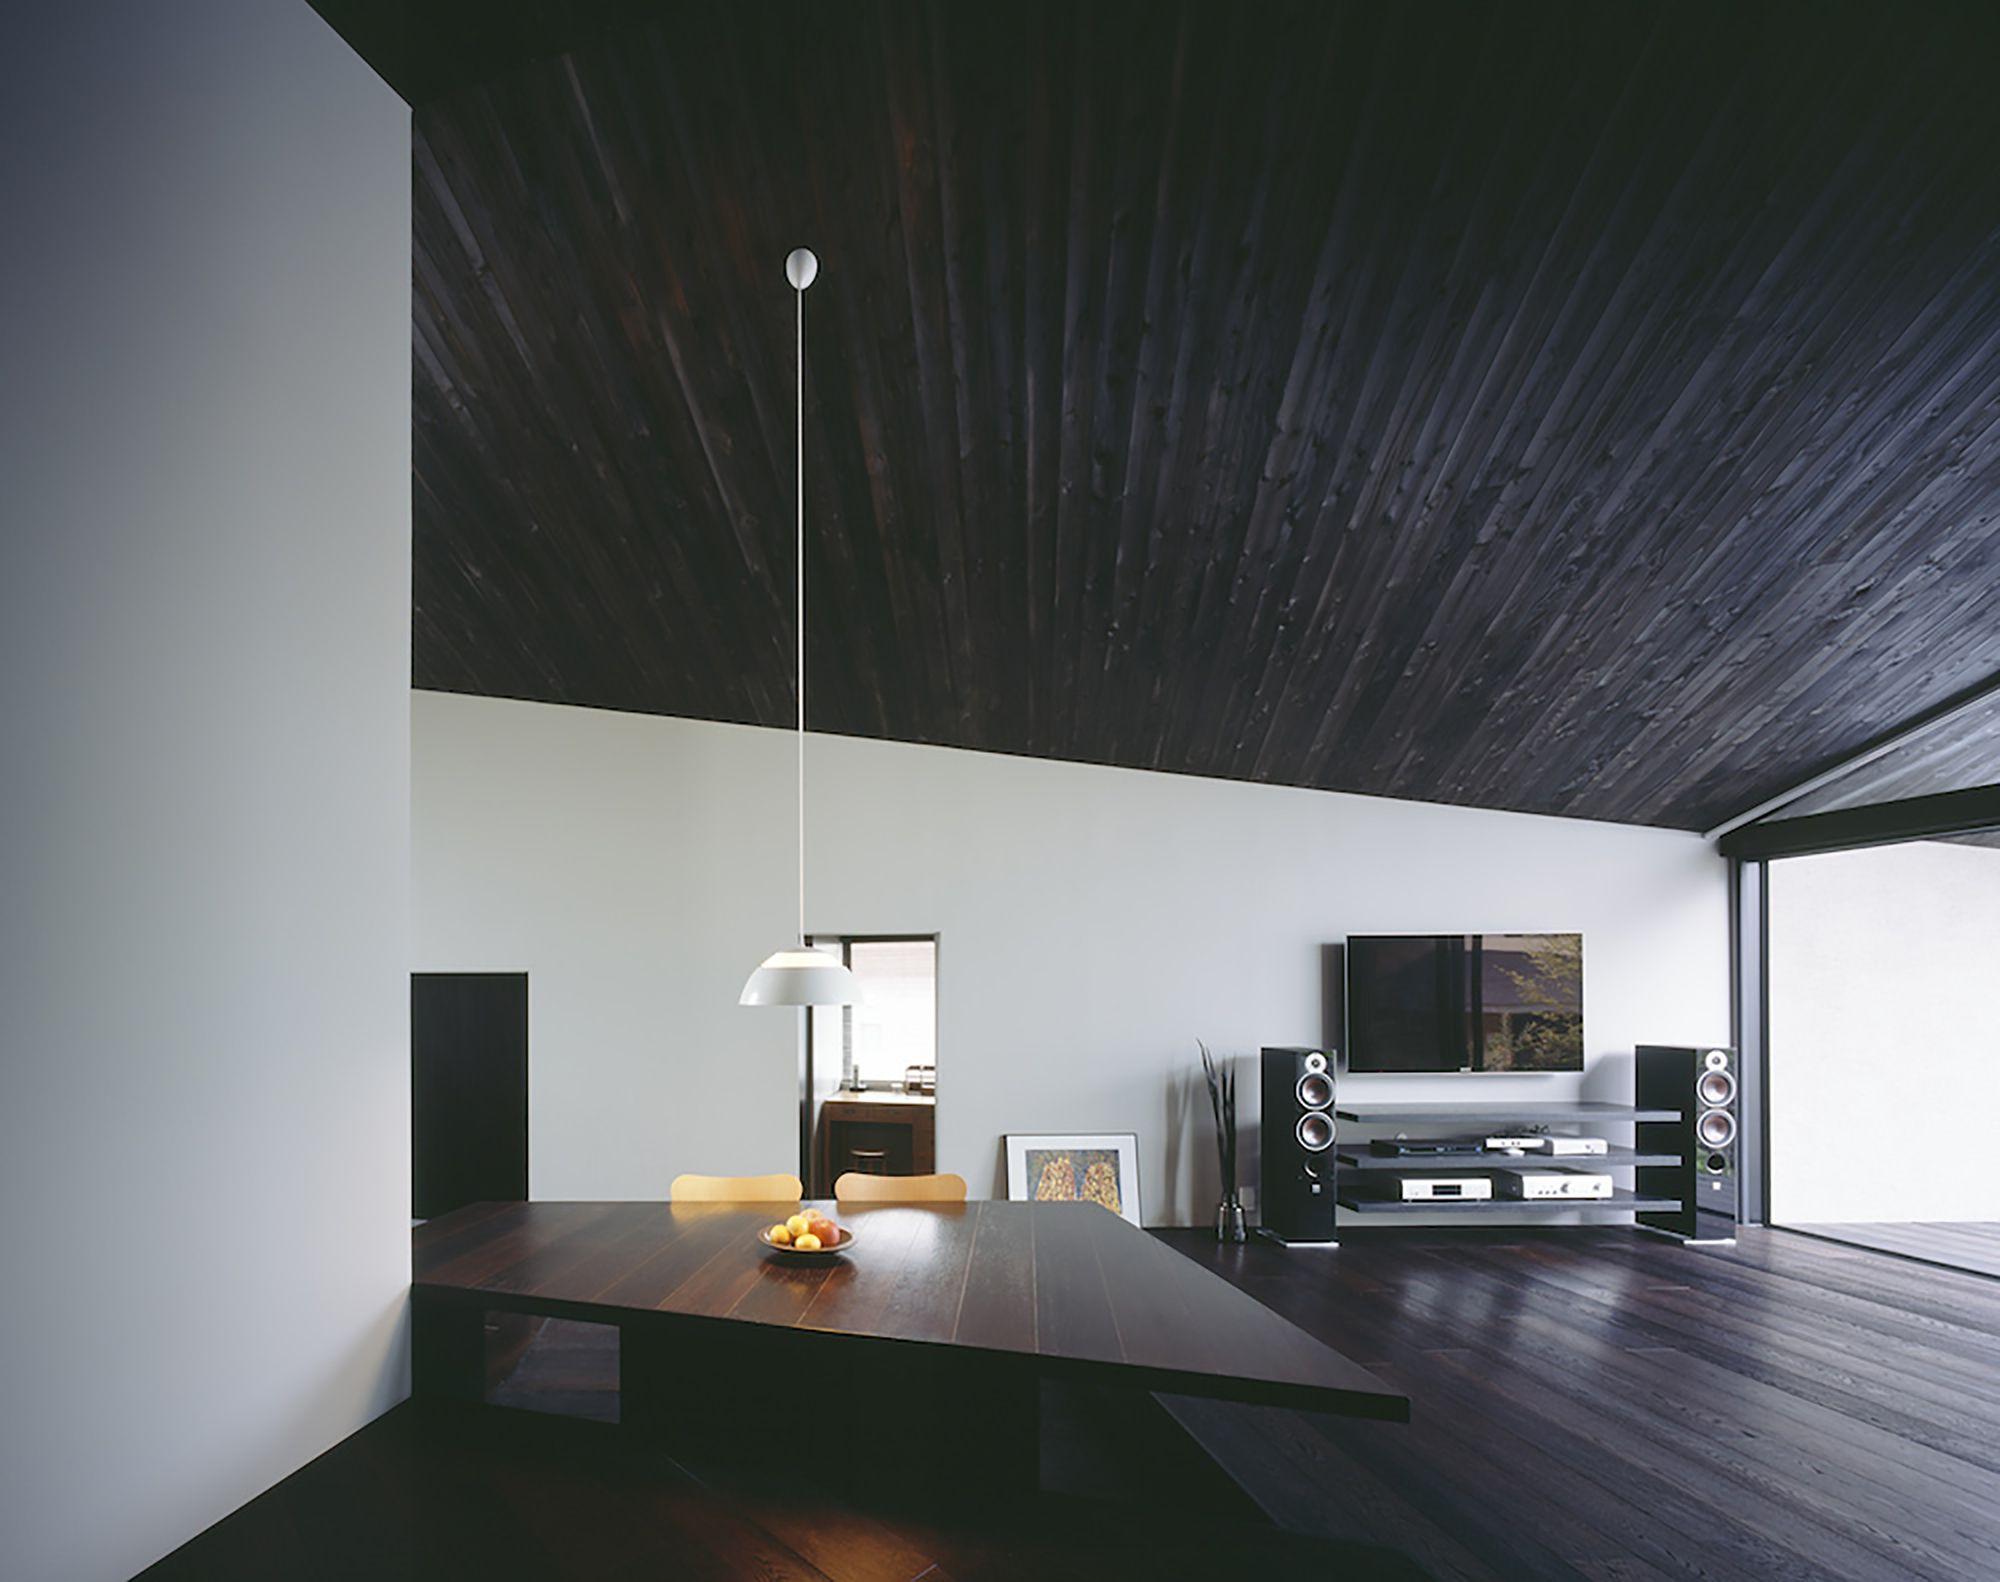 Naruse House / MDS © Masao Nishikawa   HAUS   Pinterest   House and ...